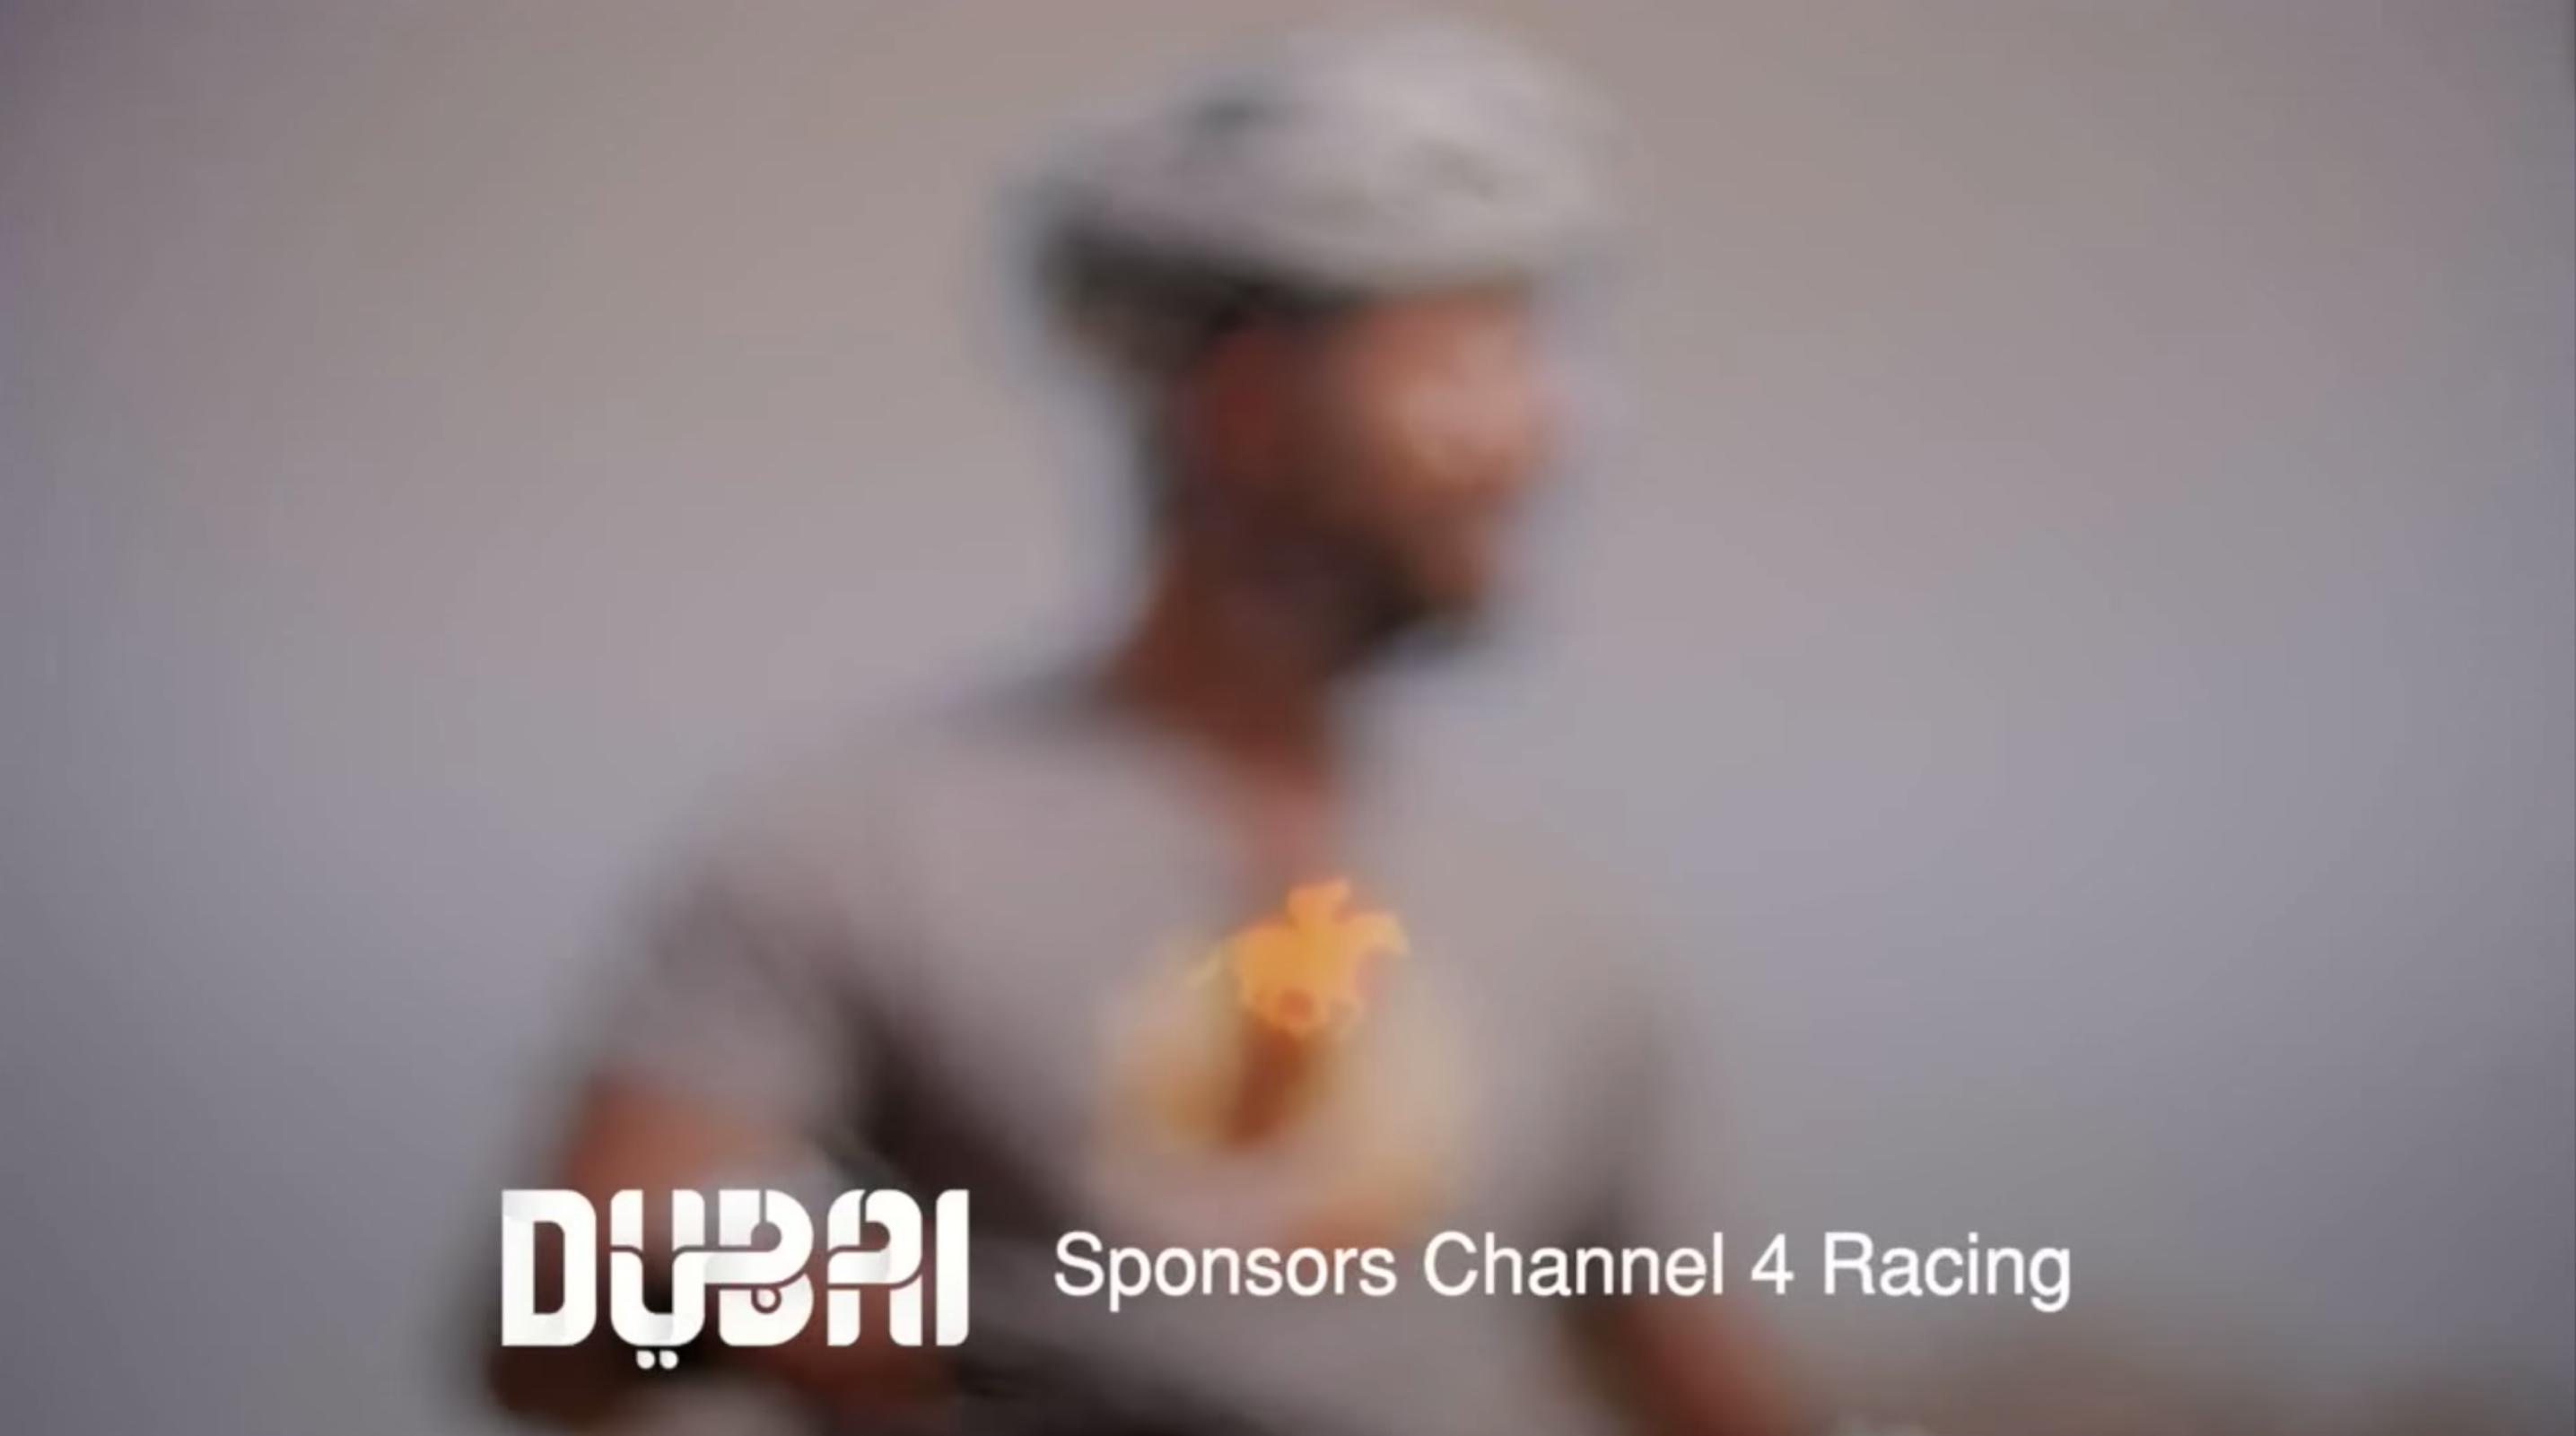 Dubai - Channel 4 Racing